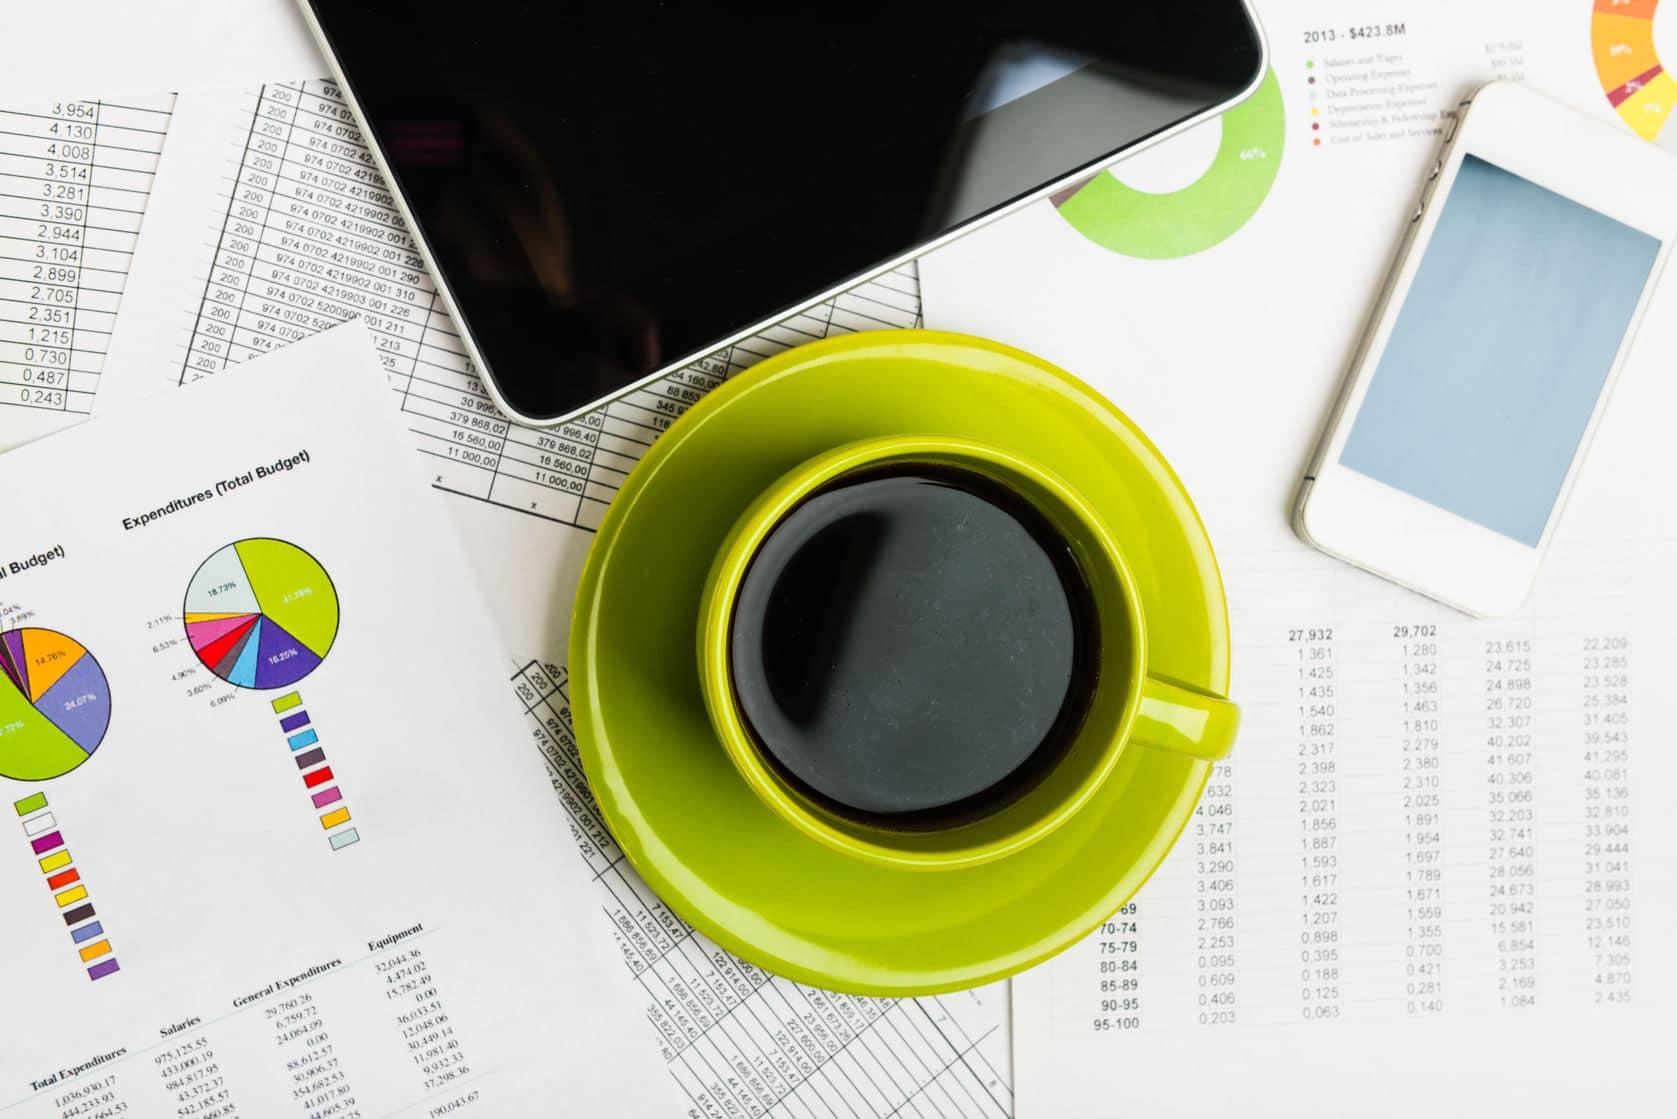 how to negotiate a raise make more money salary negotiation tips for negotiating - How To Negotiate A Pay Raise